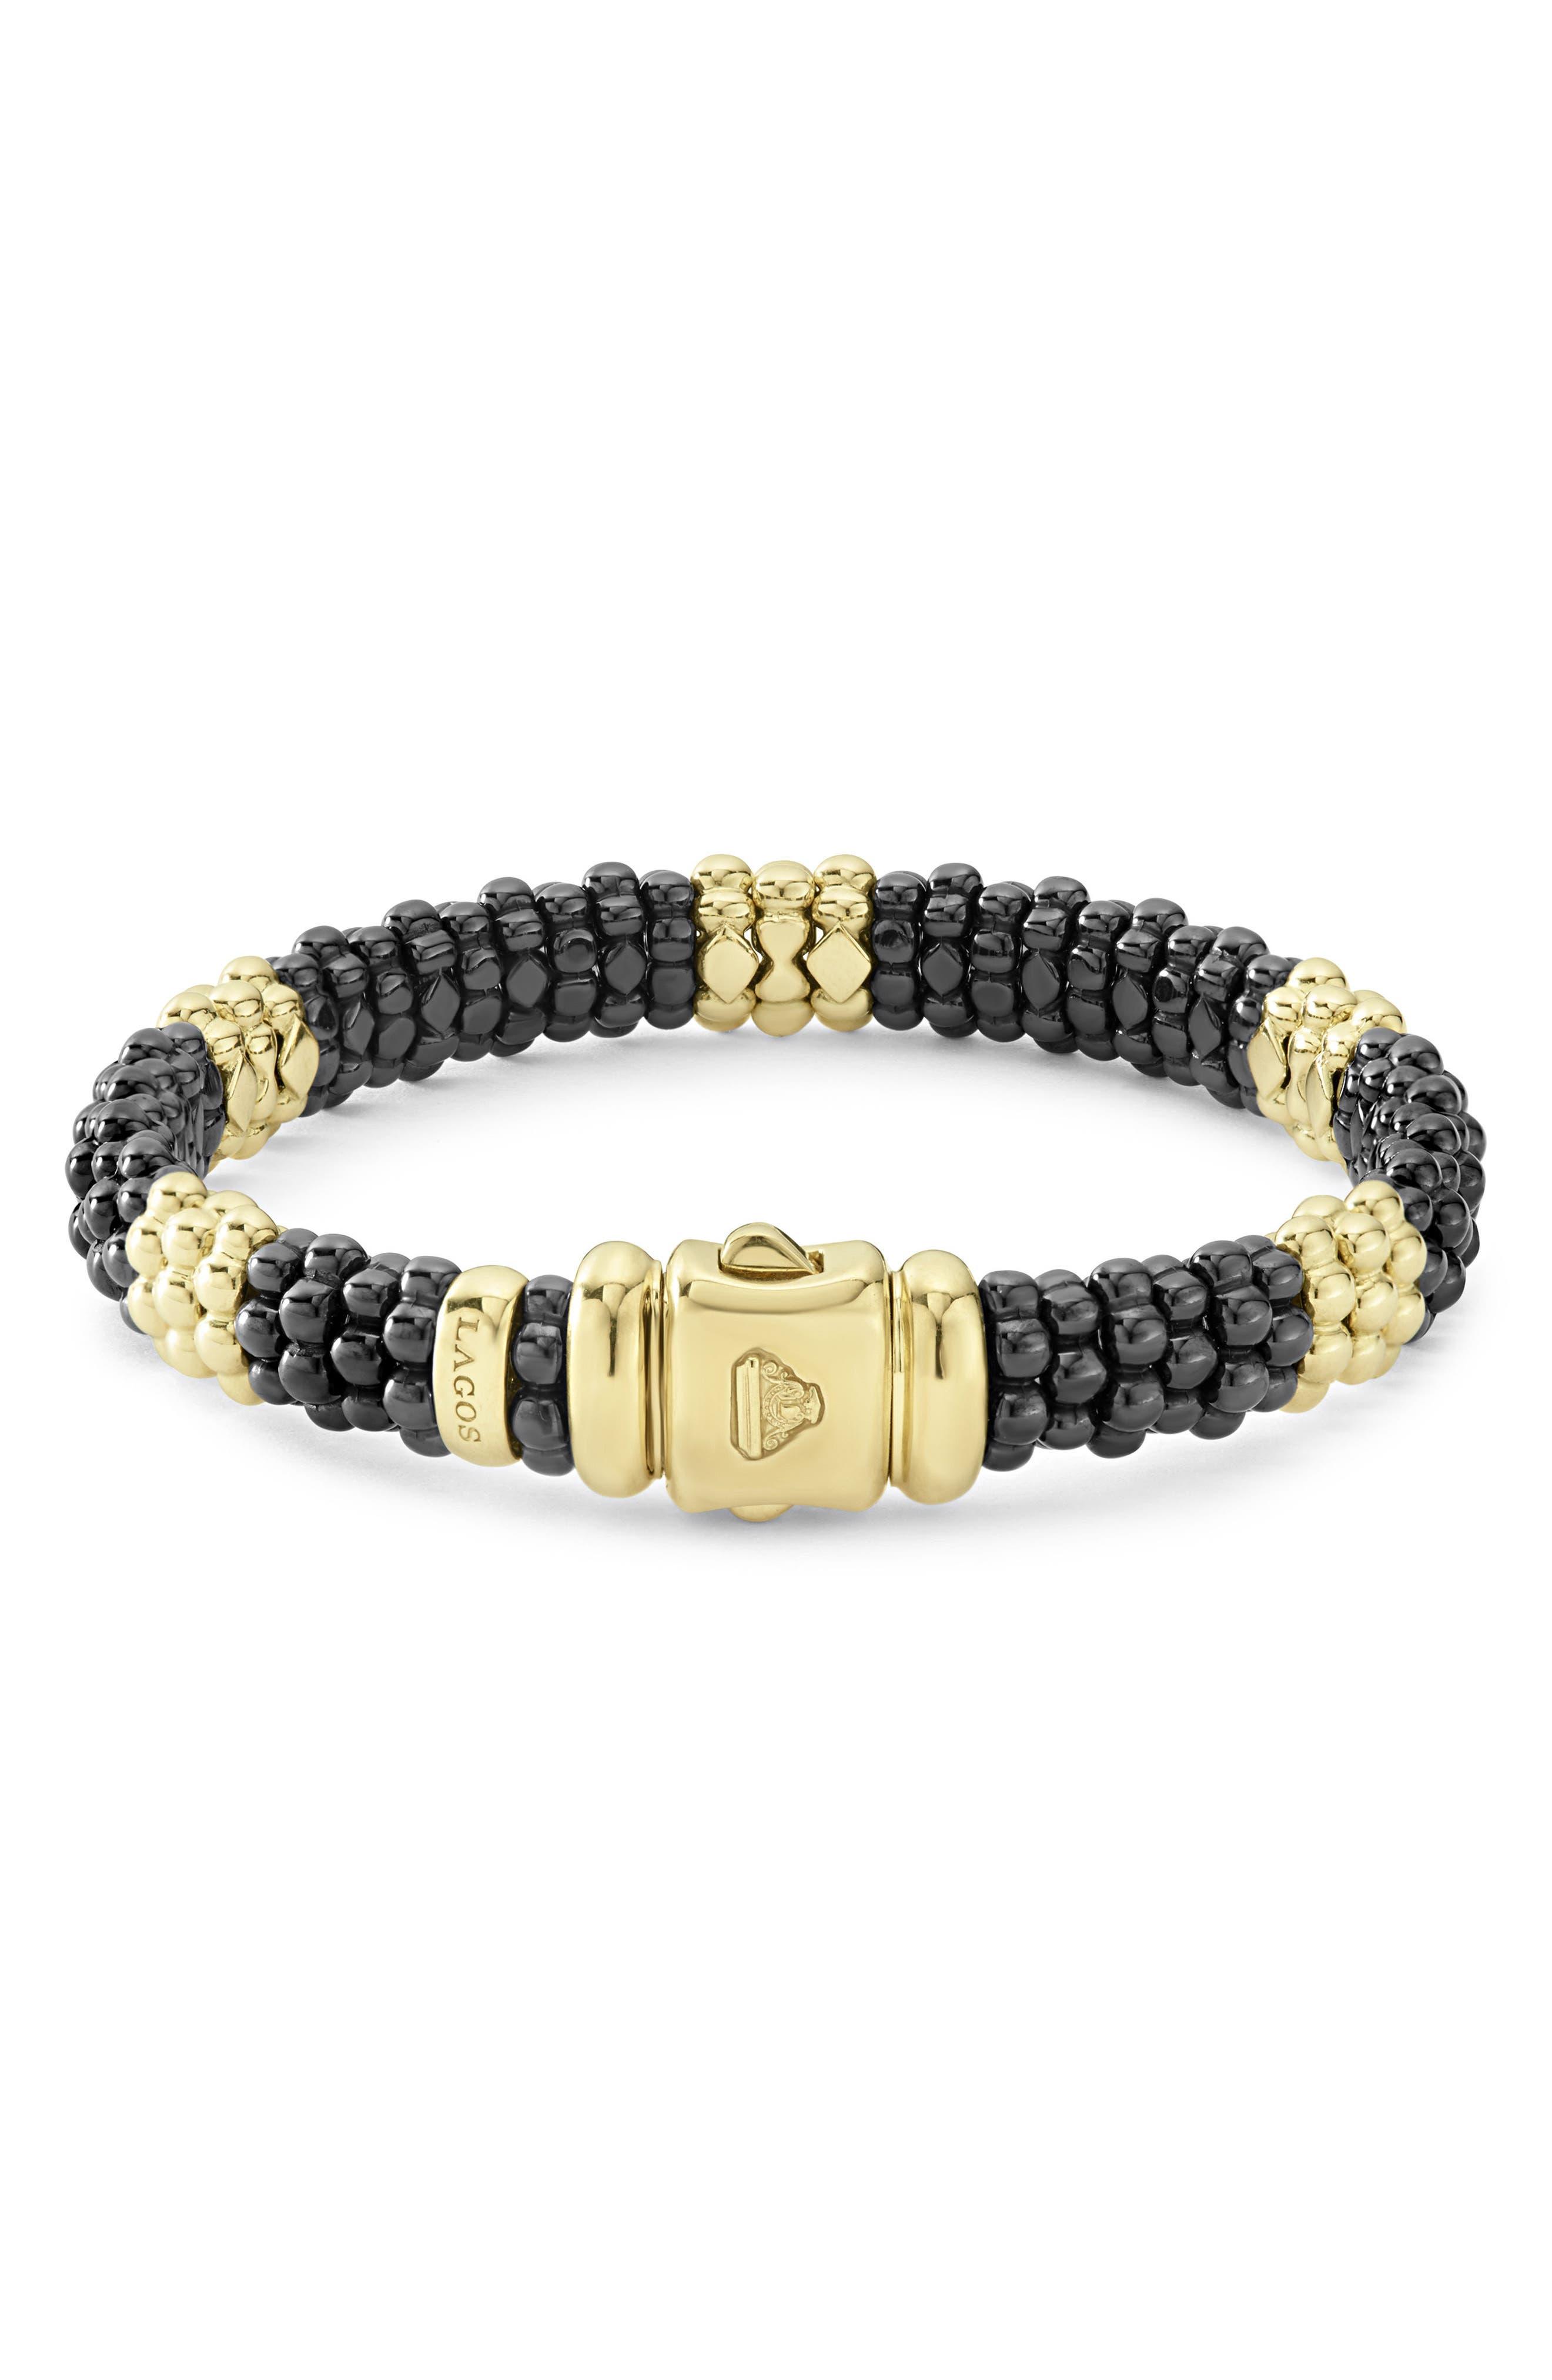 Gold & Black Caviar Station Bracelet,                             Alternate thumbnail 3, color,                             GOLD